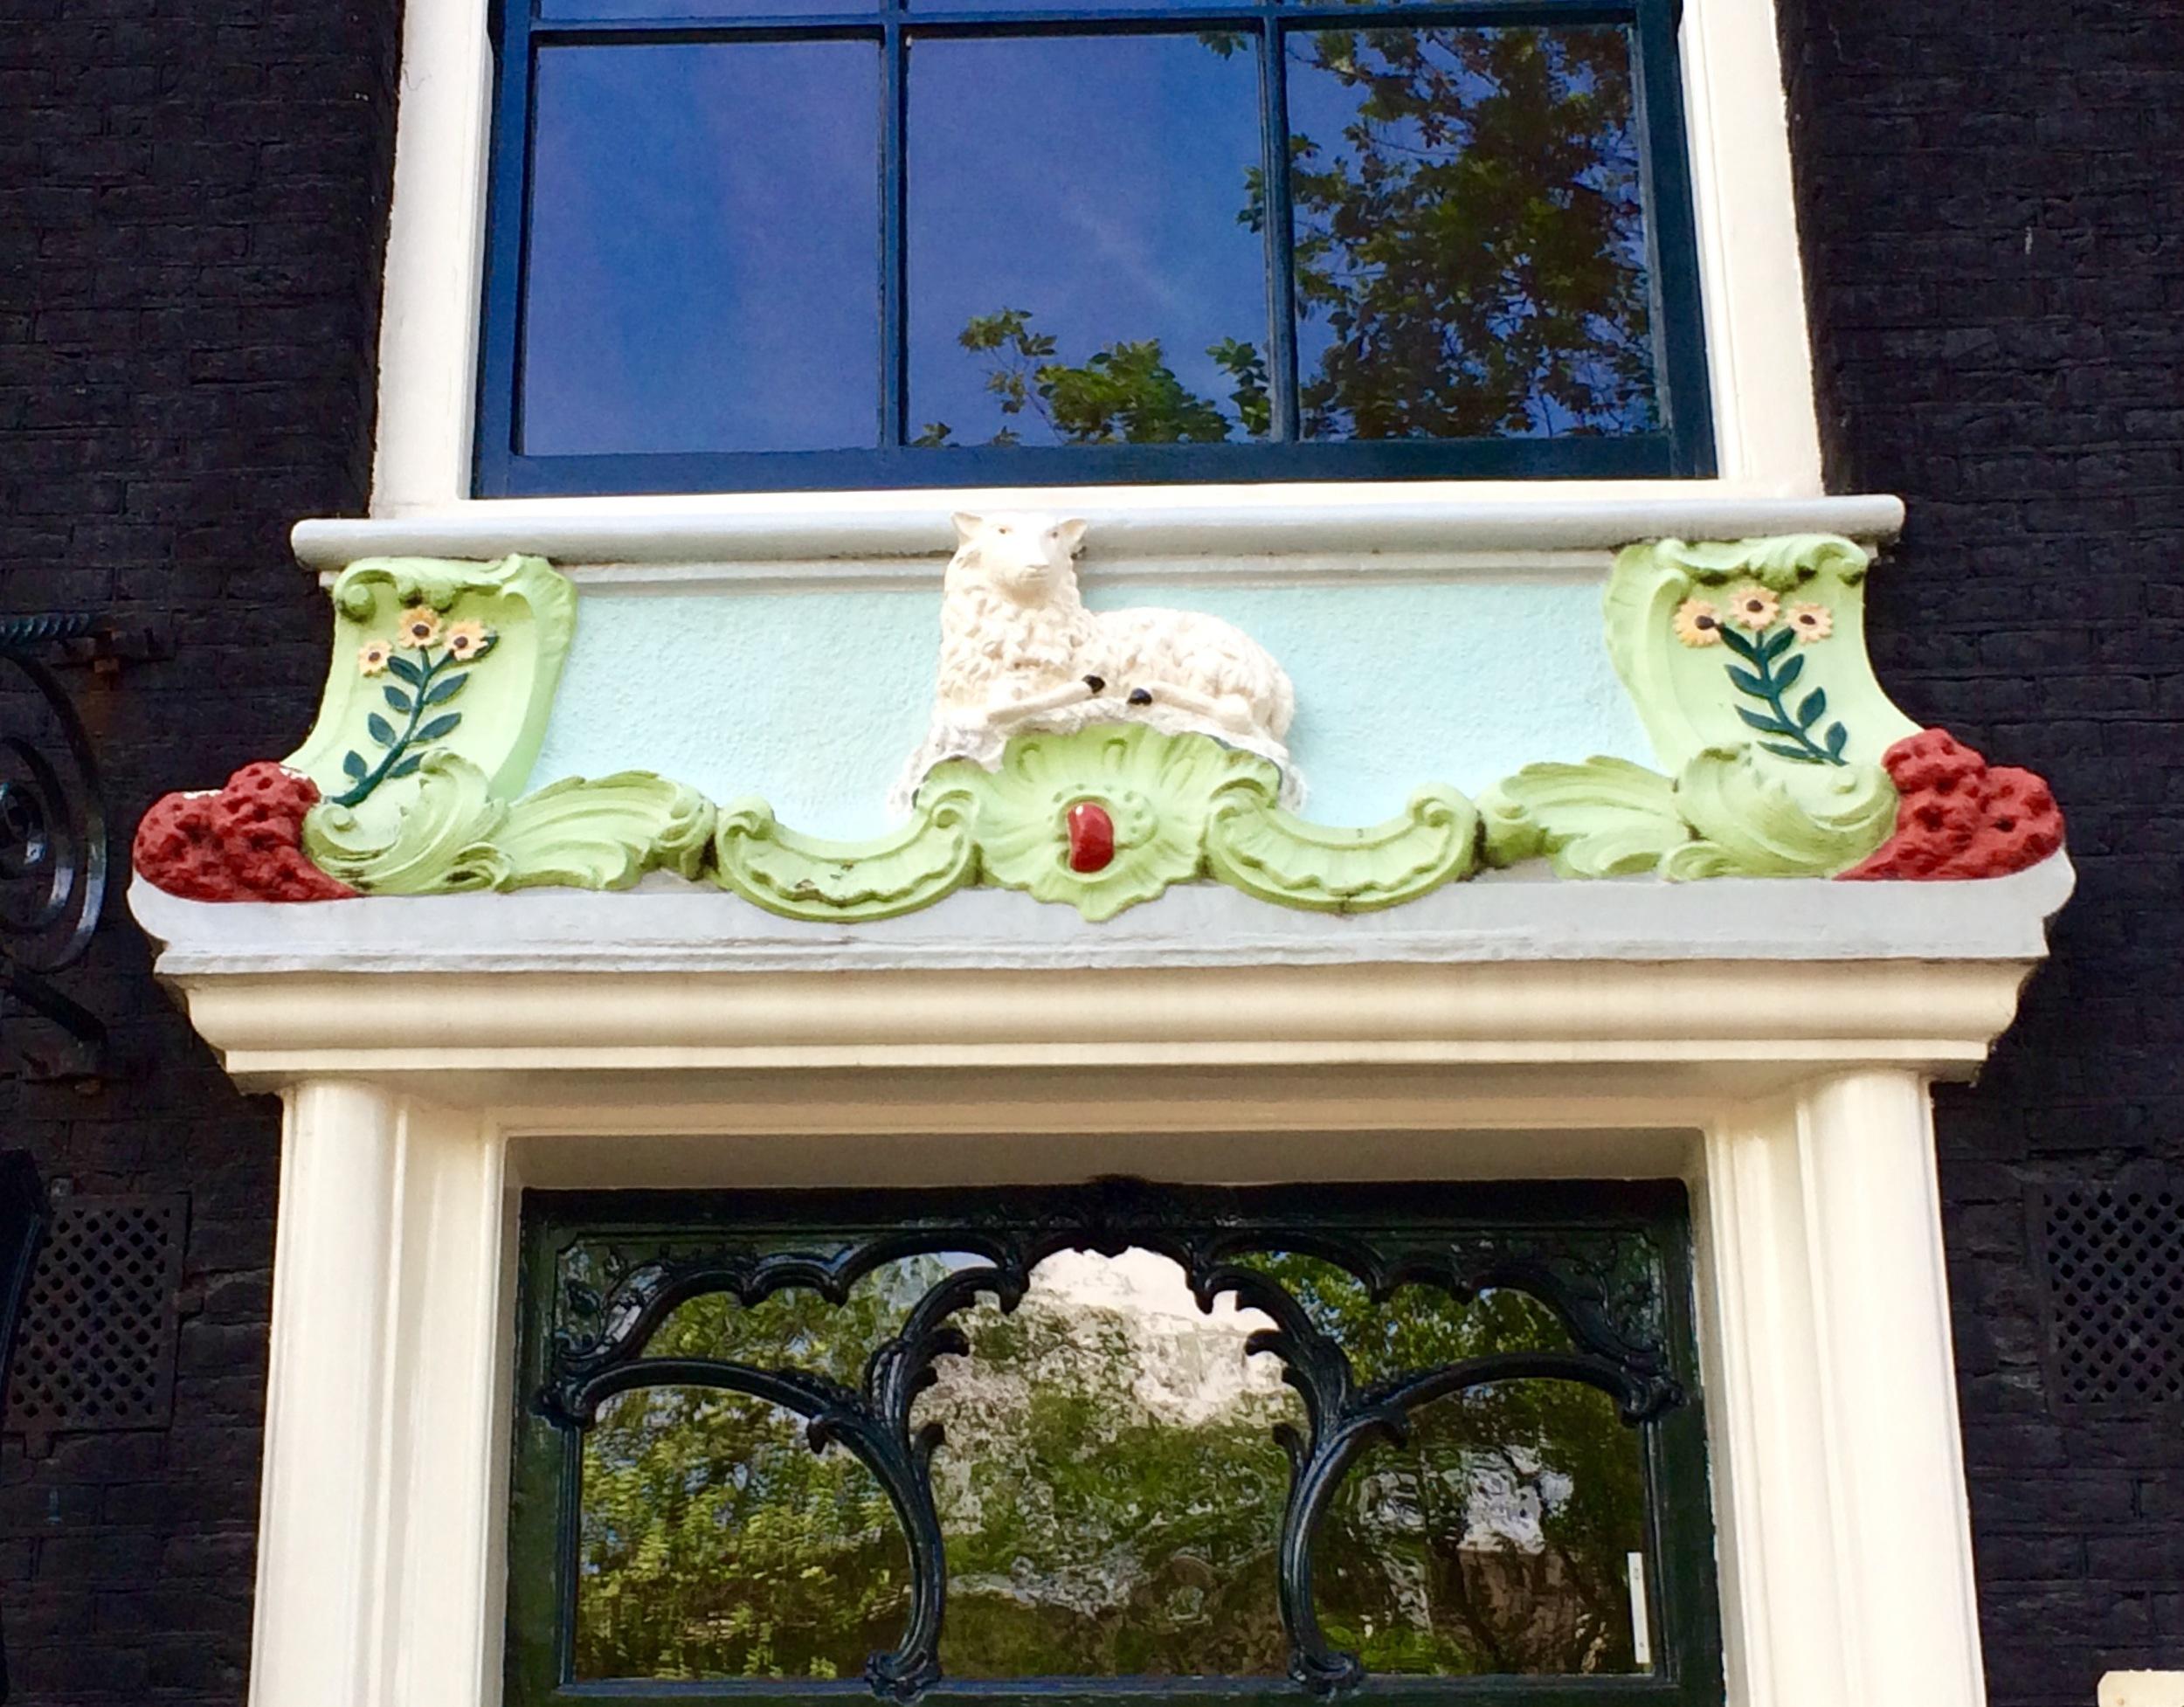 Doorway on canal Prinsengracht